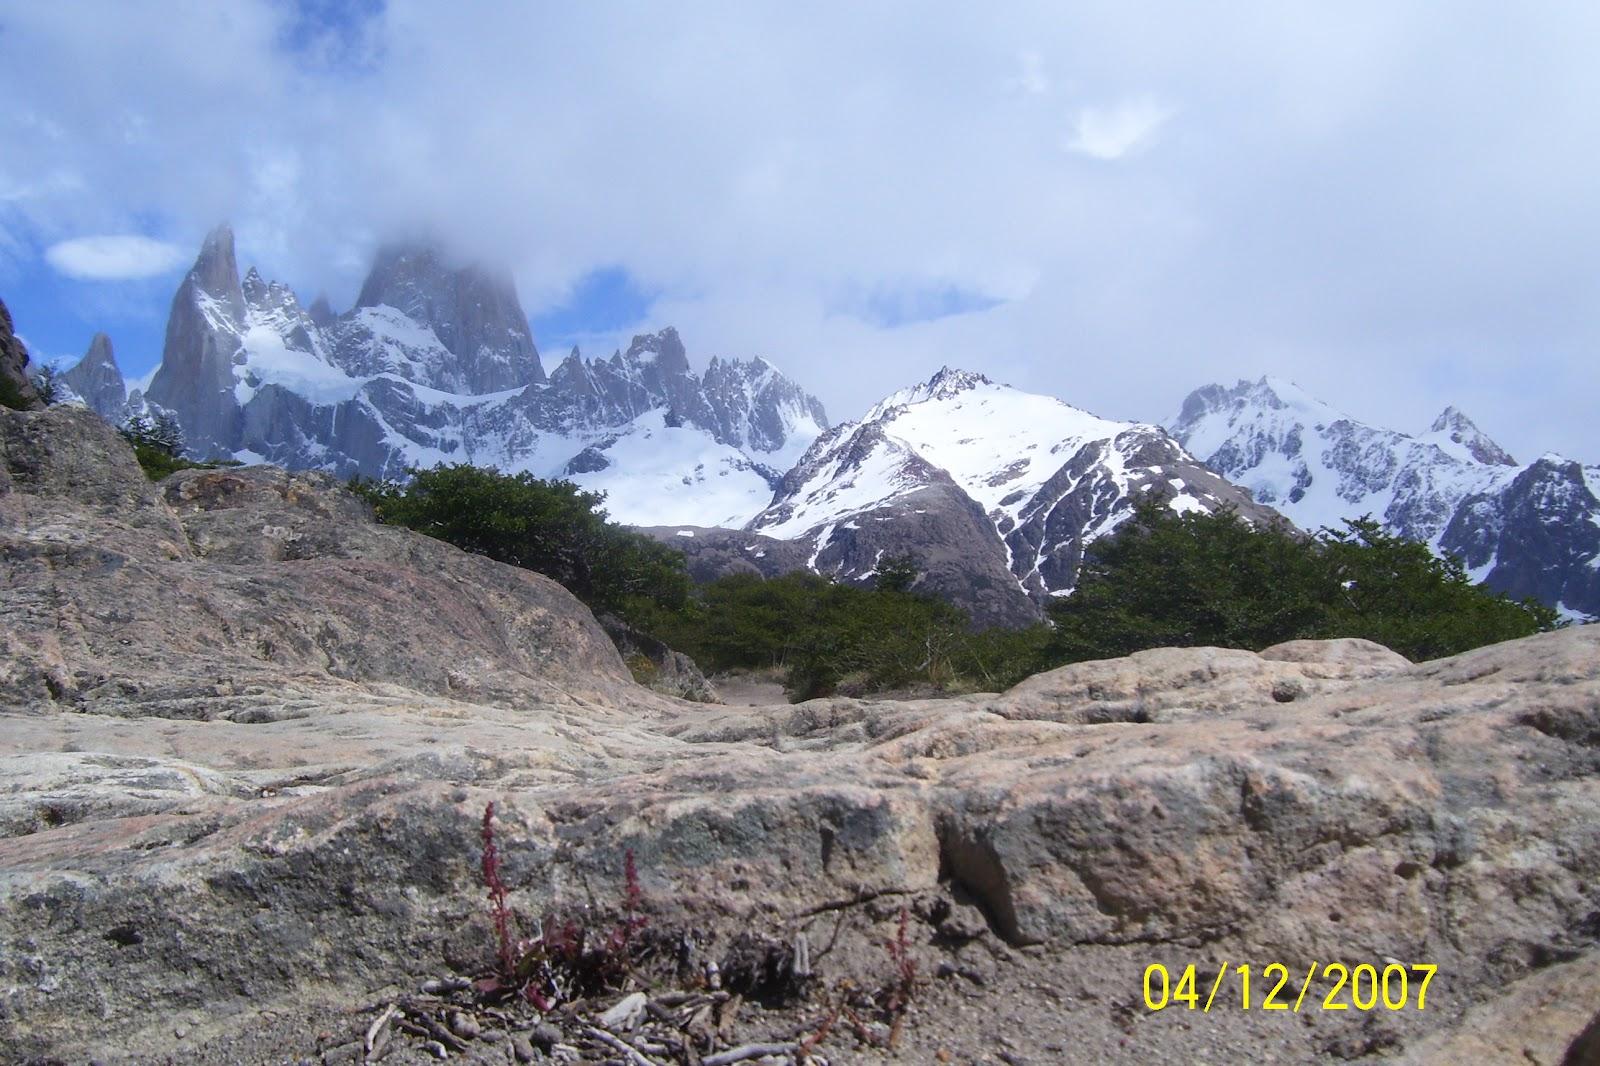 Chalten paraiso argentino sur 22image imagenes del mundo for Mundo del espectaculo argentino